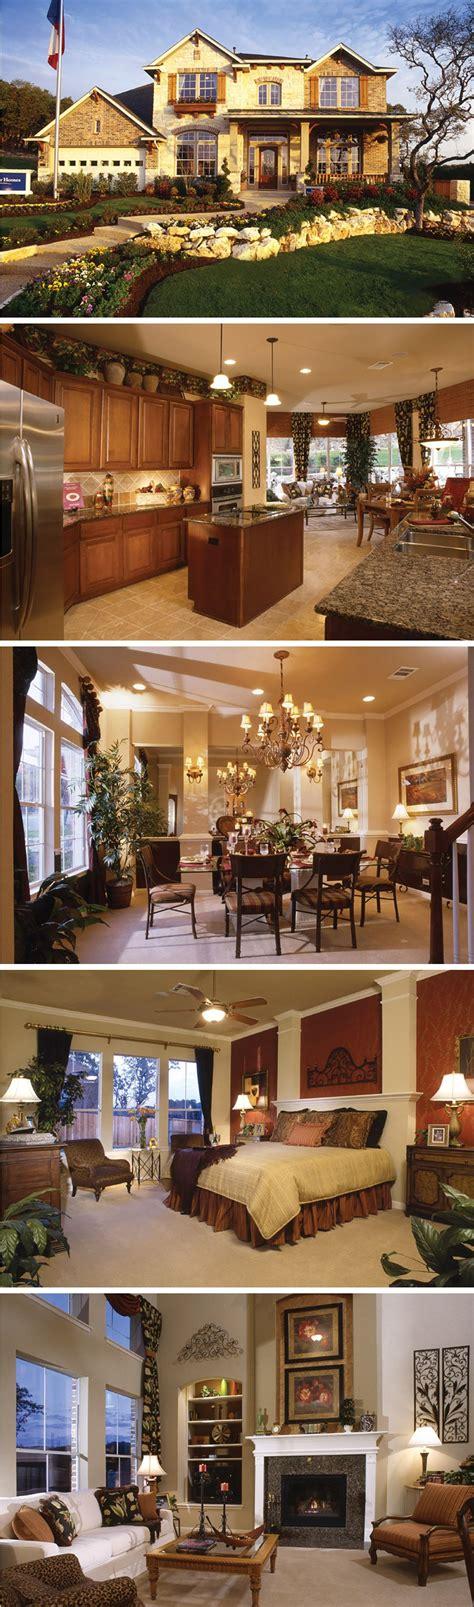 smithfield  david weekley homes  rogers ranch   stunning floorplan  features